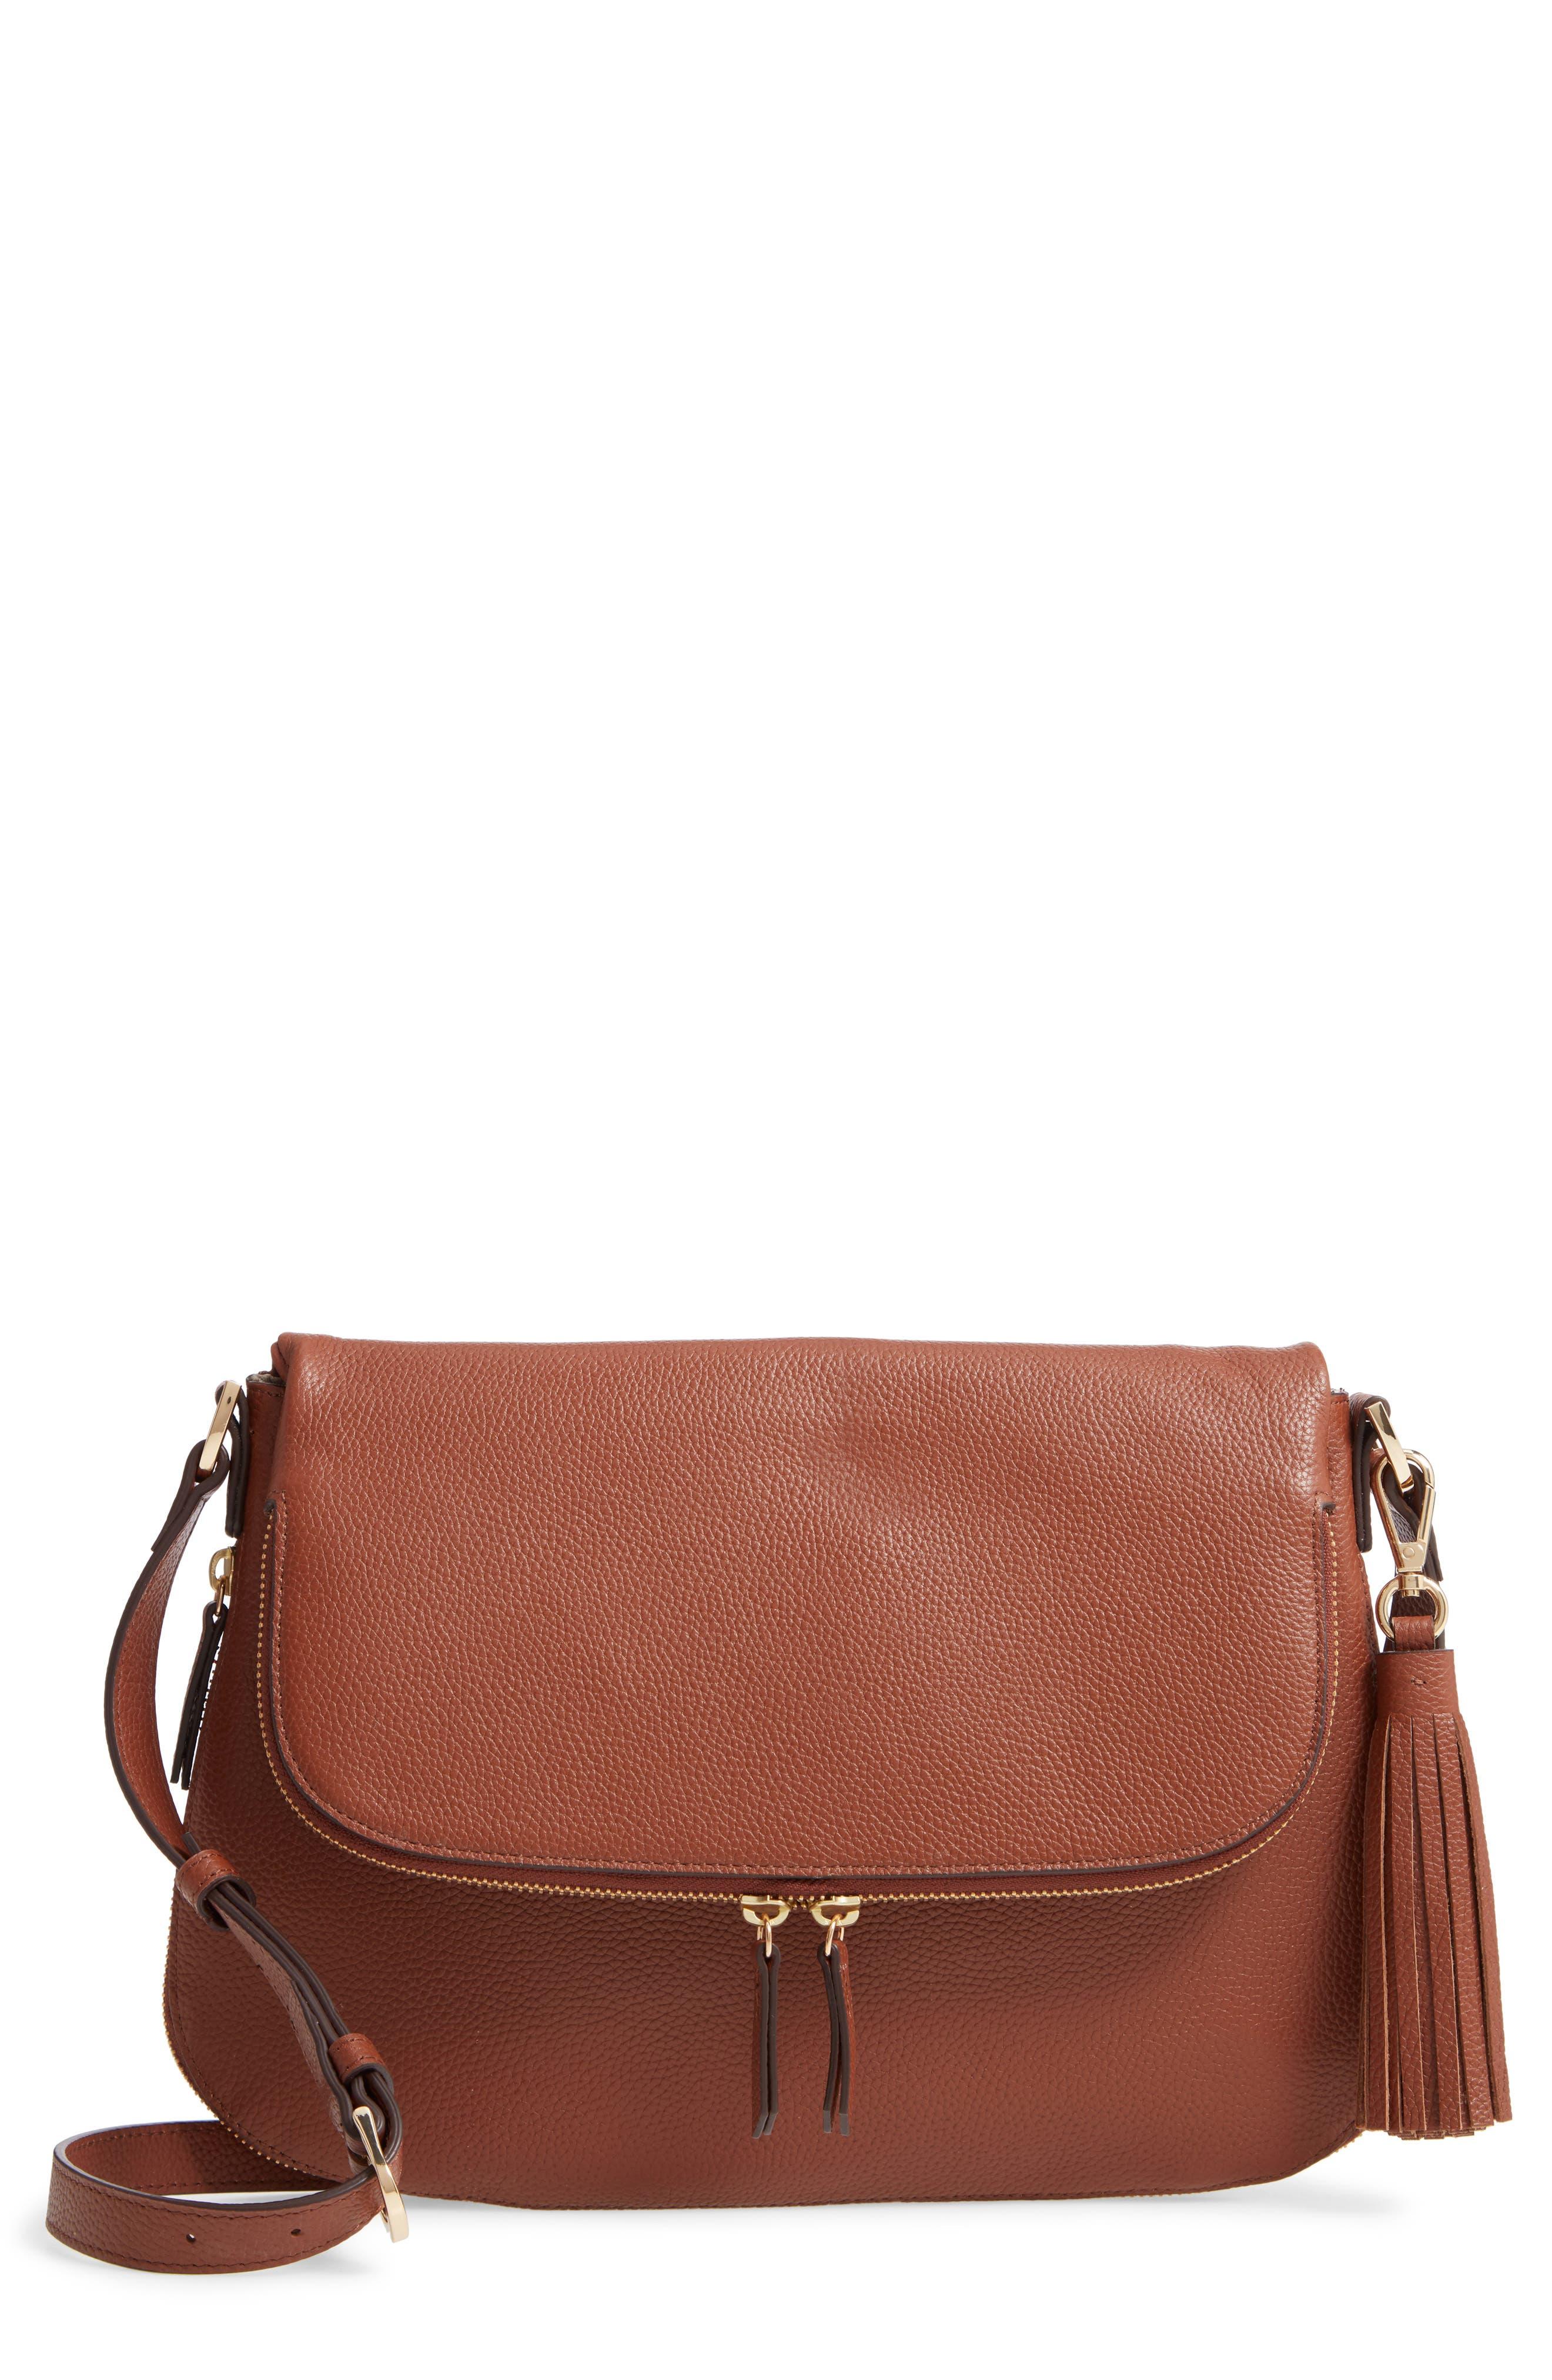 Kara Leather Expandable Crossbody Bag, Main, color, BROWN AZTEC